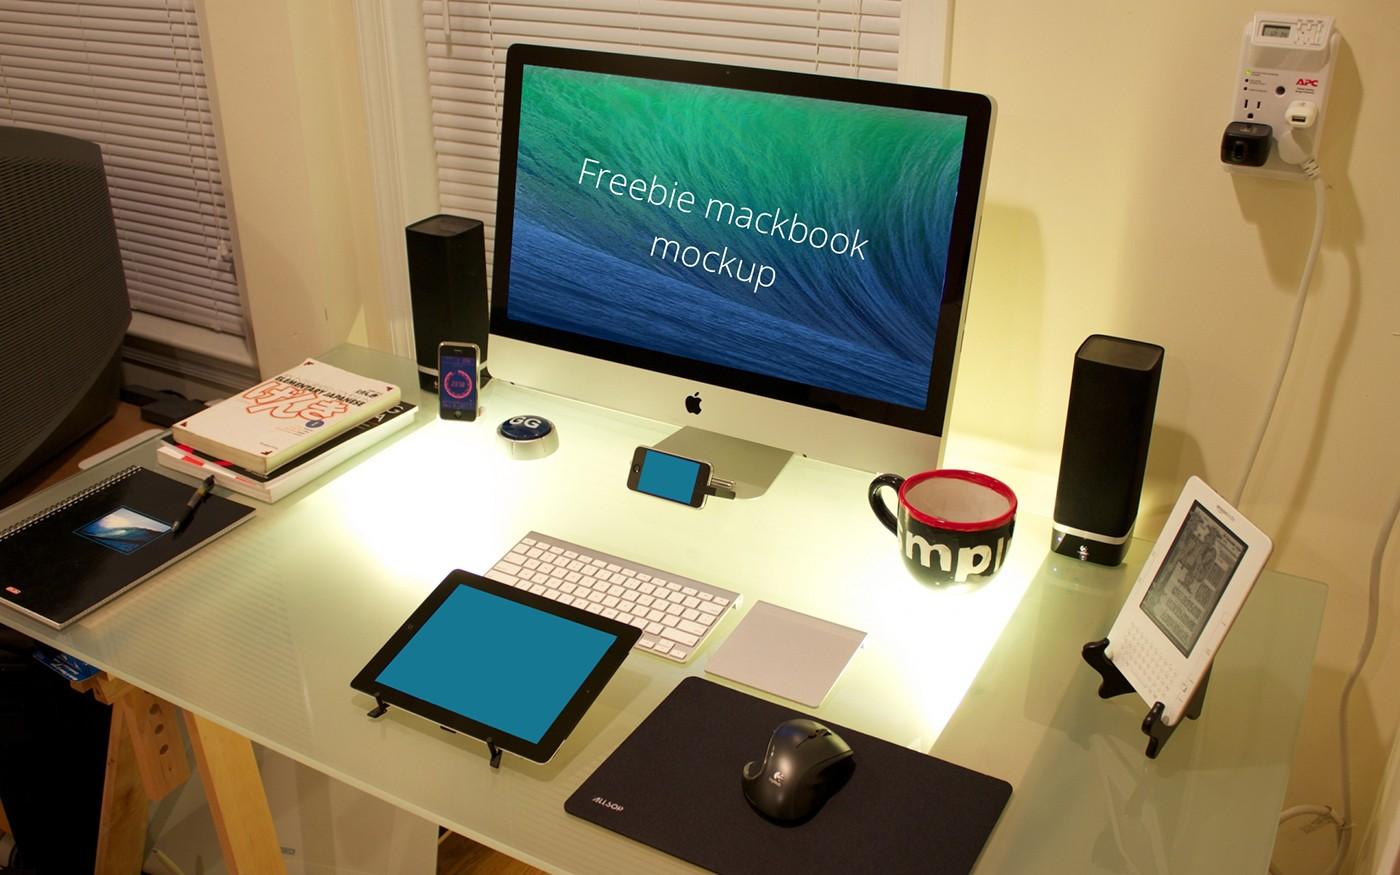 Freebie mackbook mockup